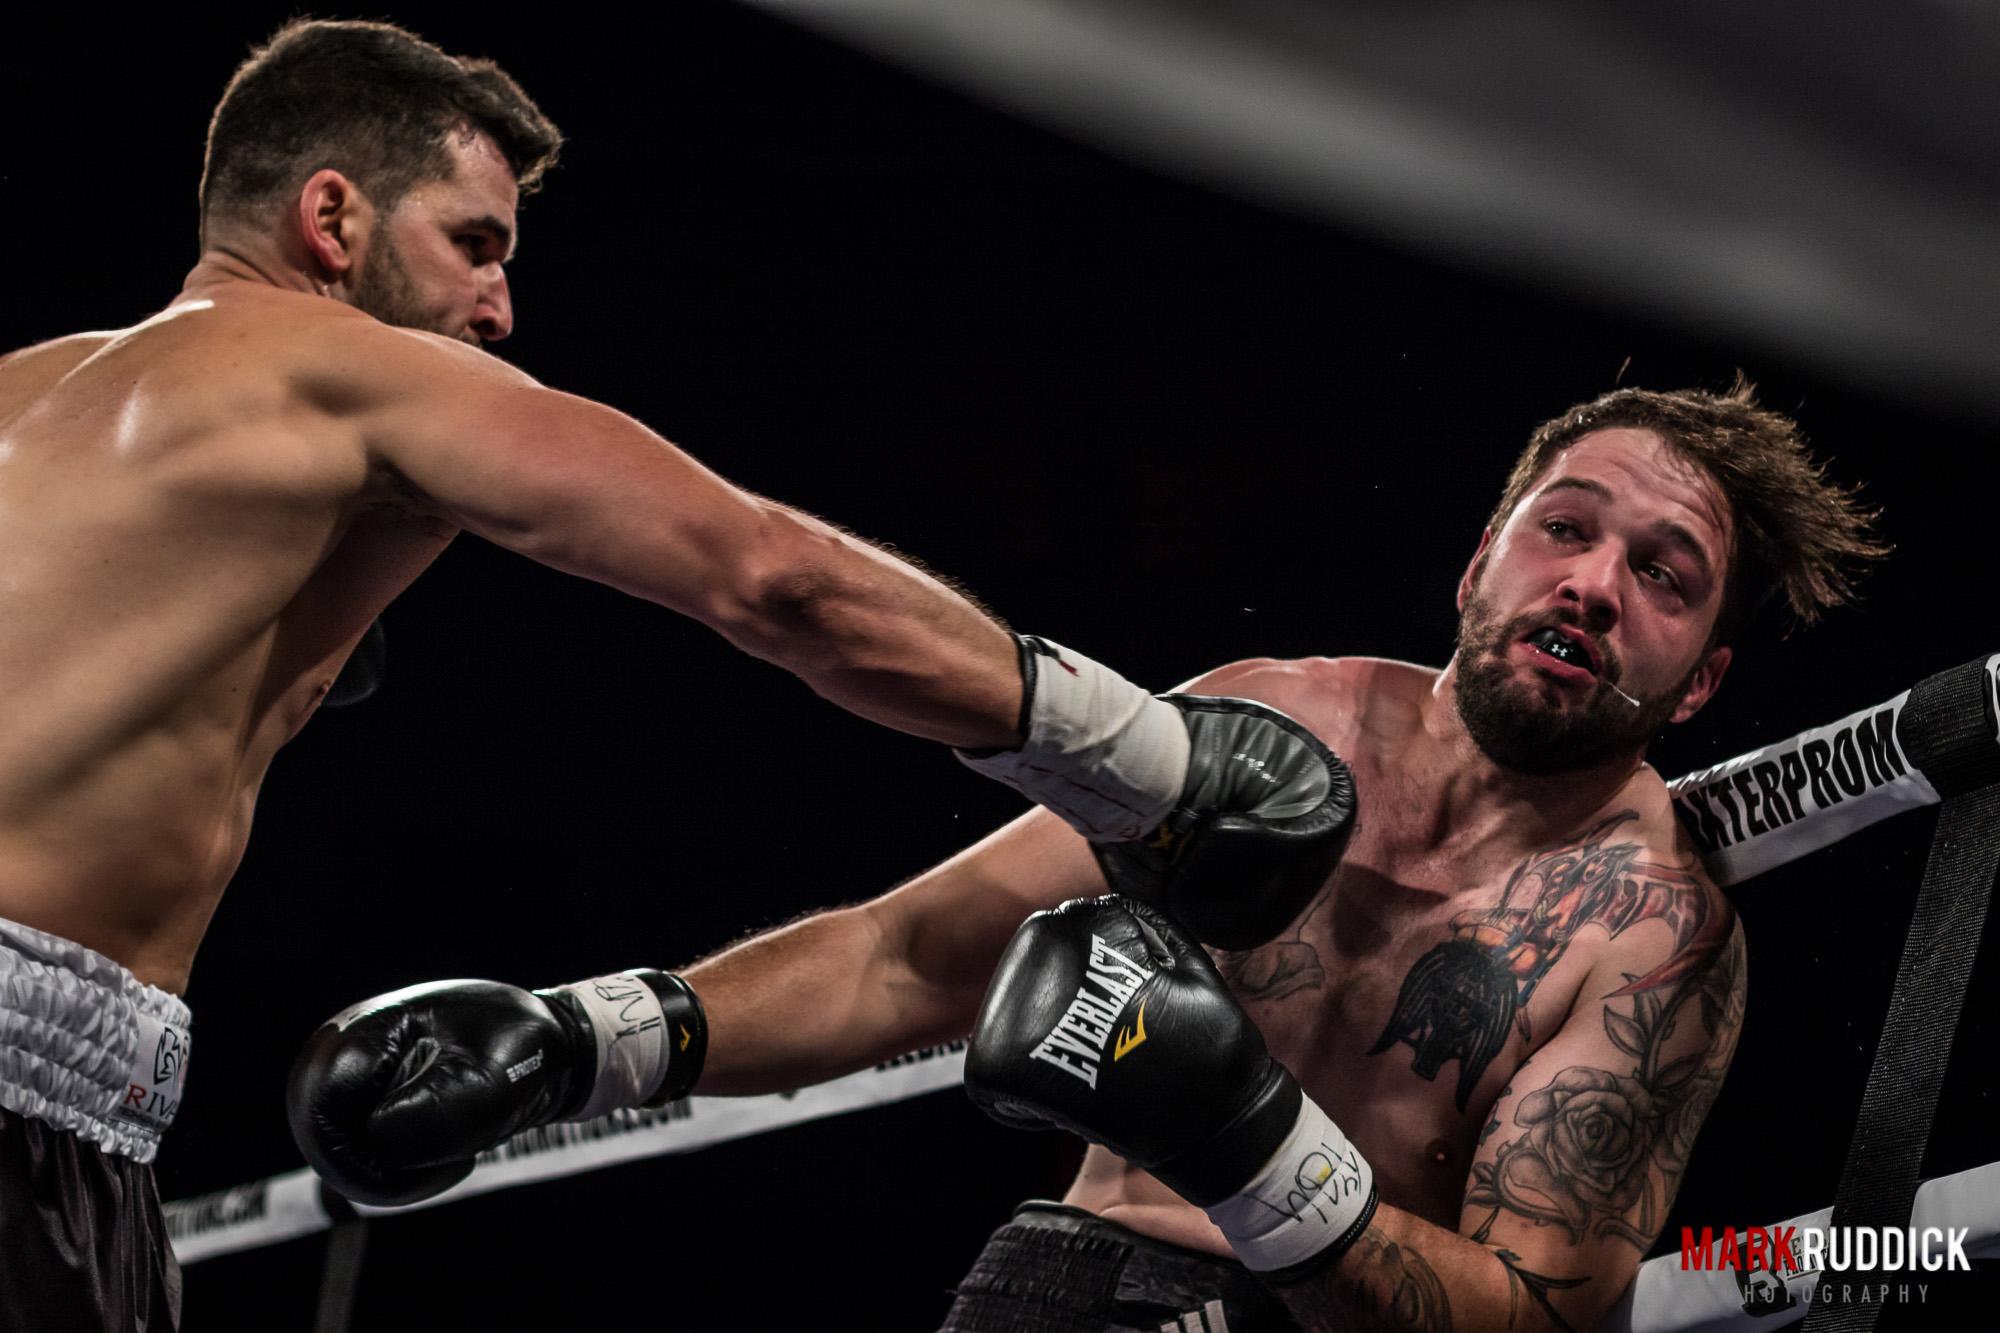 Bout #2 - Nick Fantauzzi vs Tyler O'Donnell